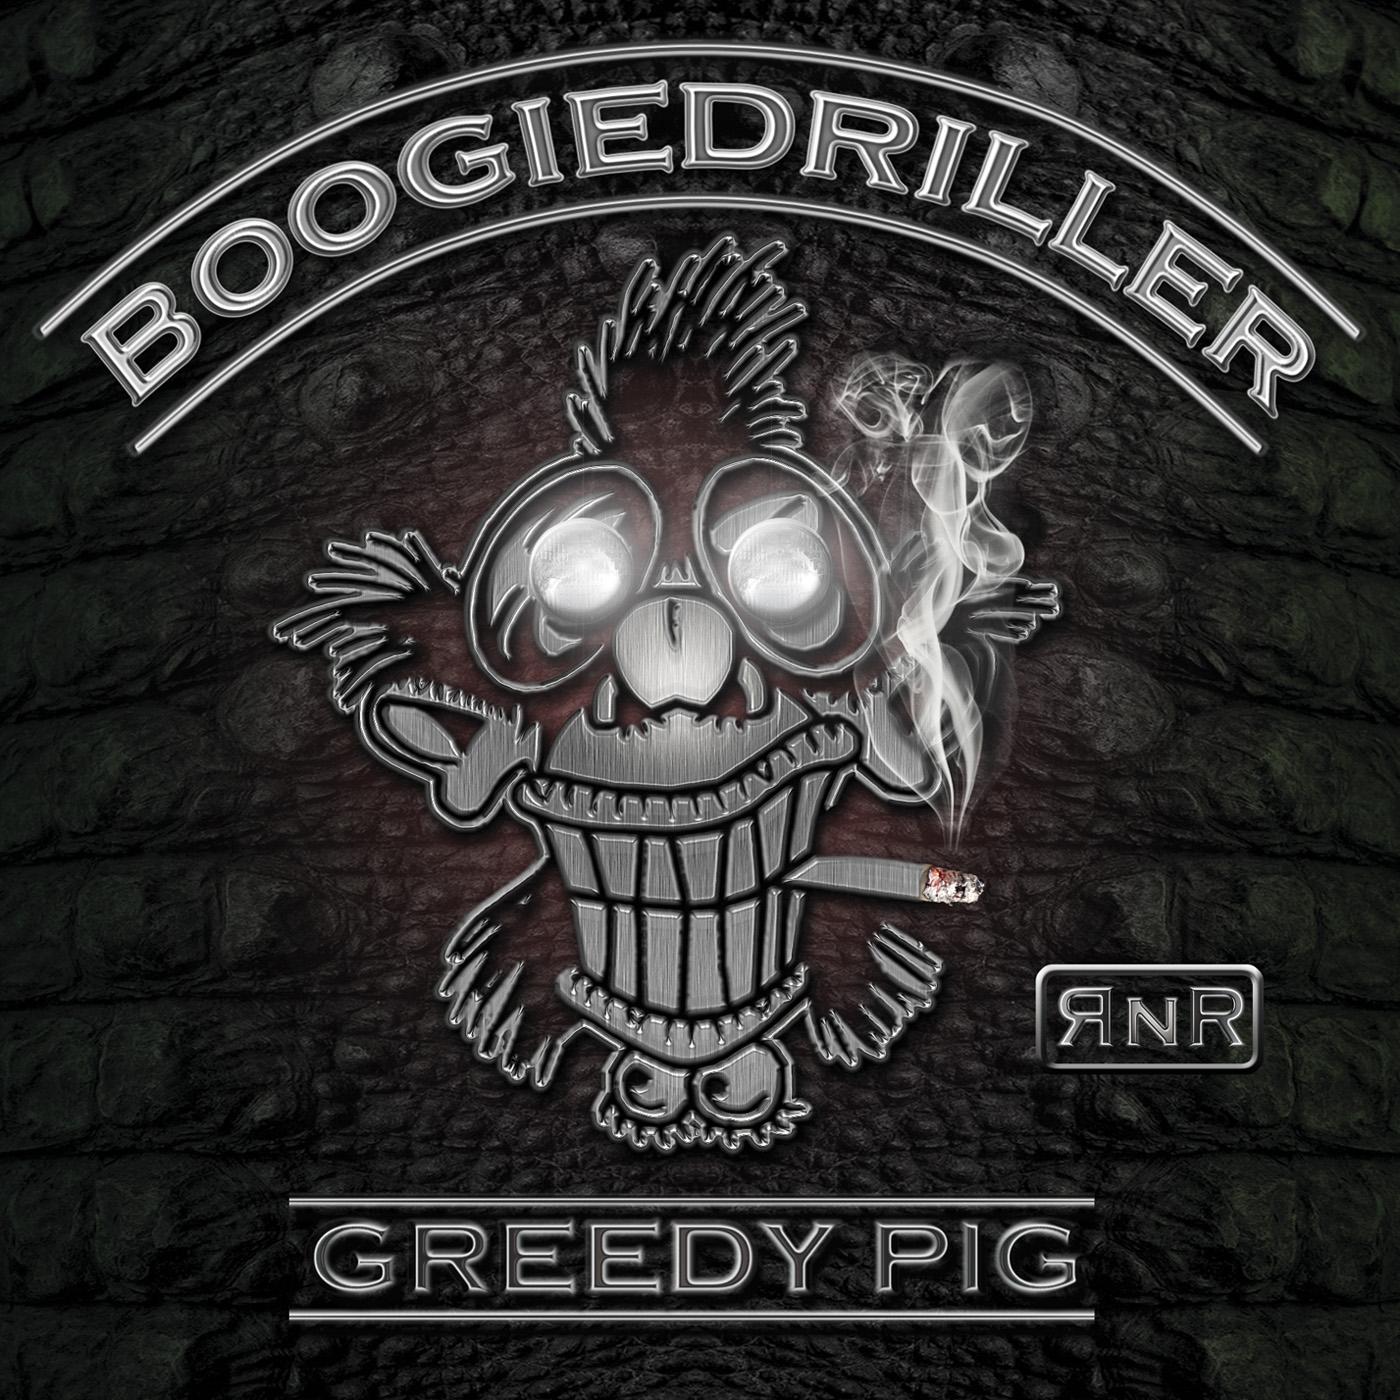 Greedy Pig: Boogiedriller